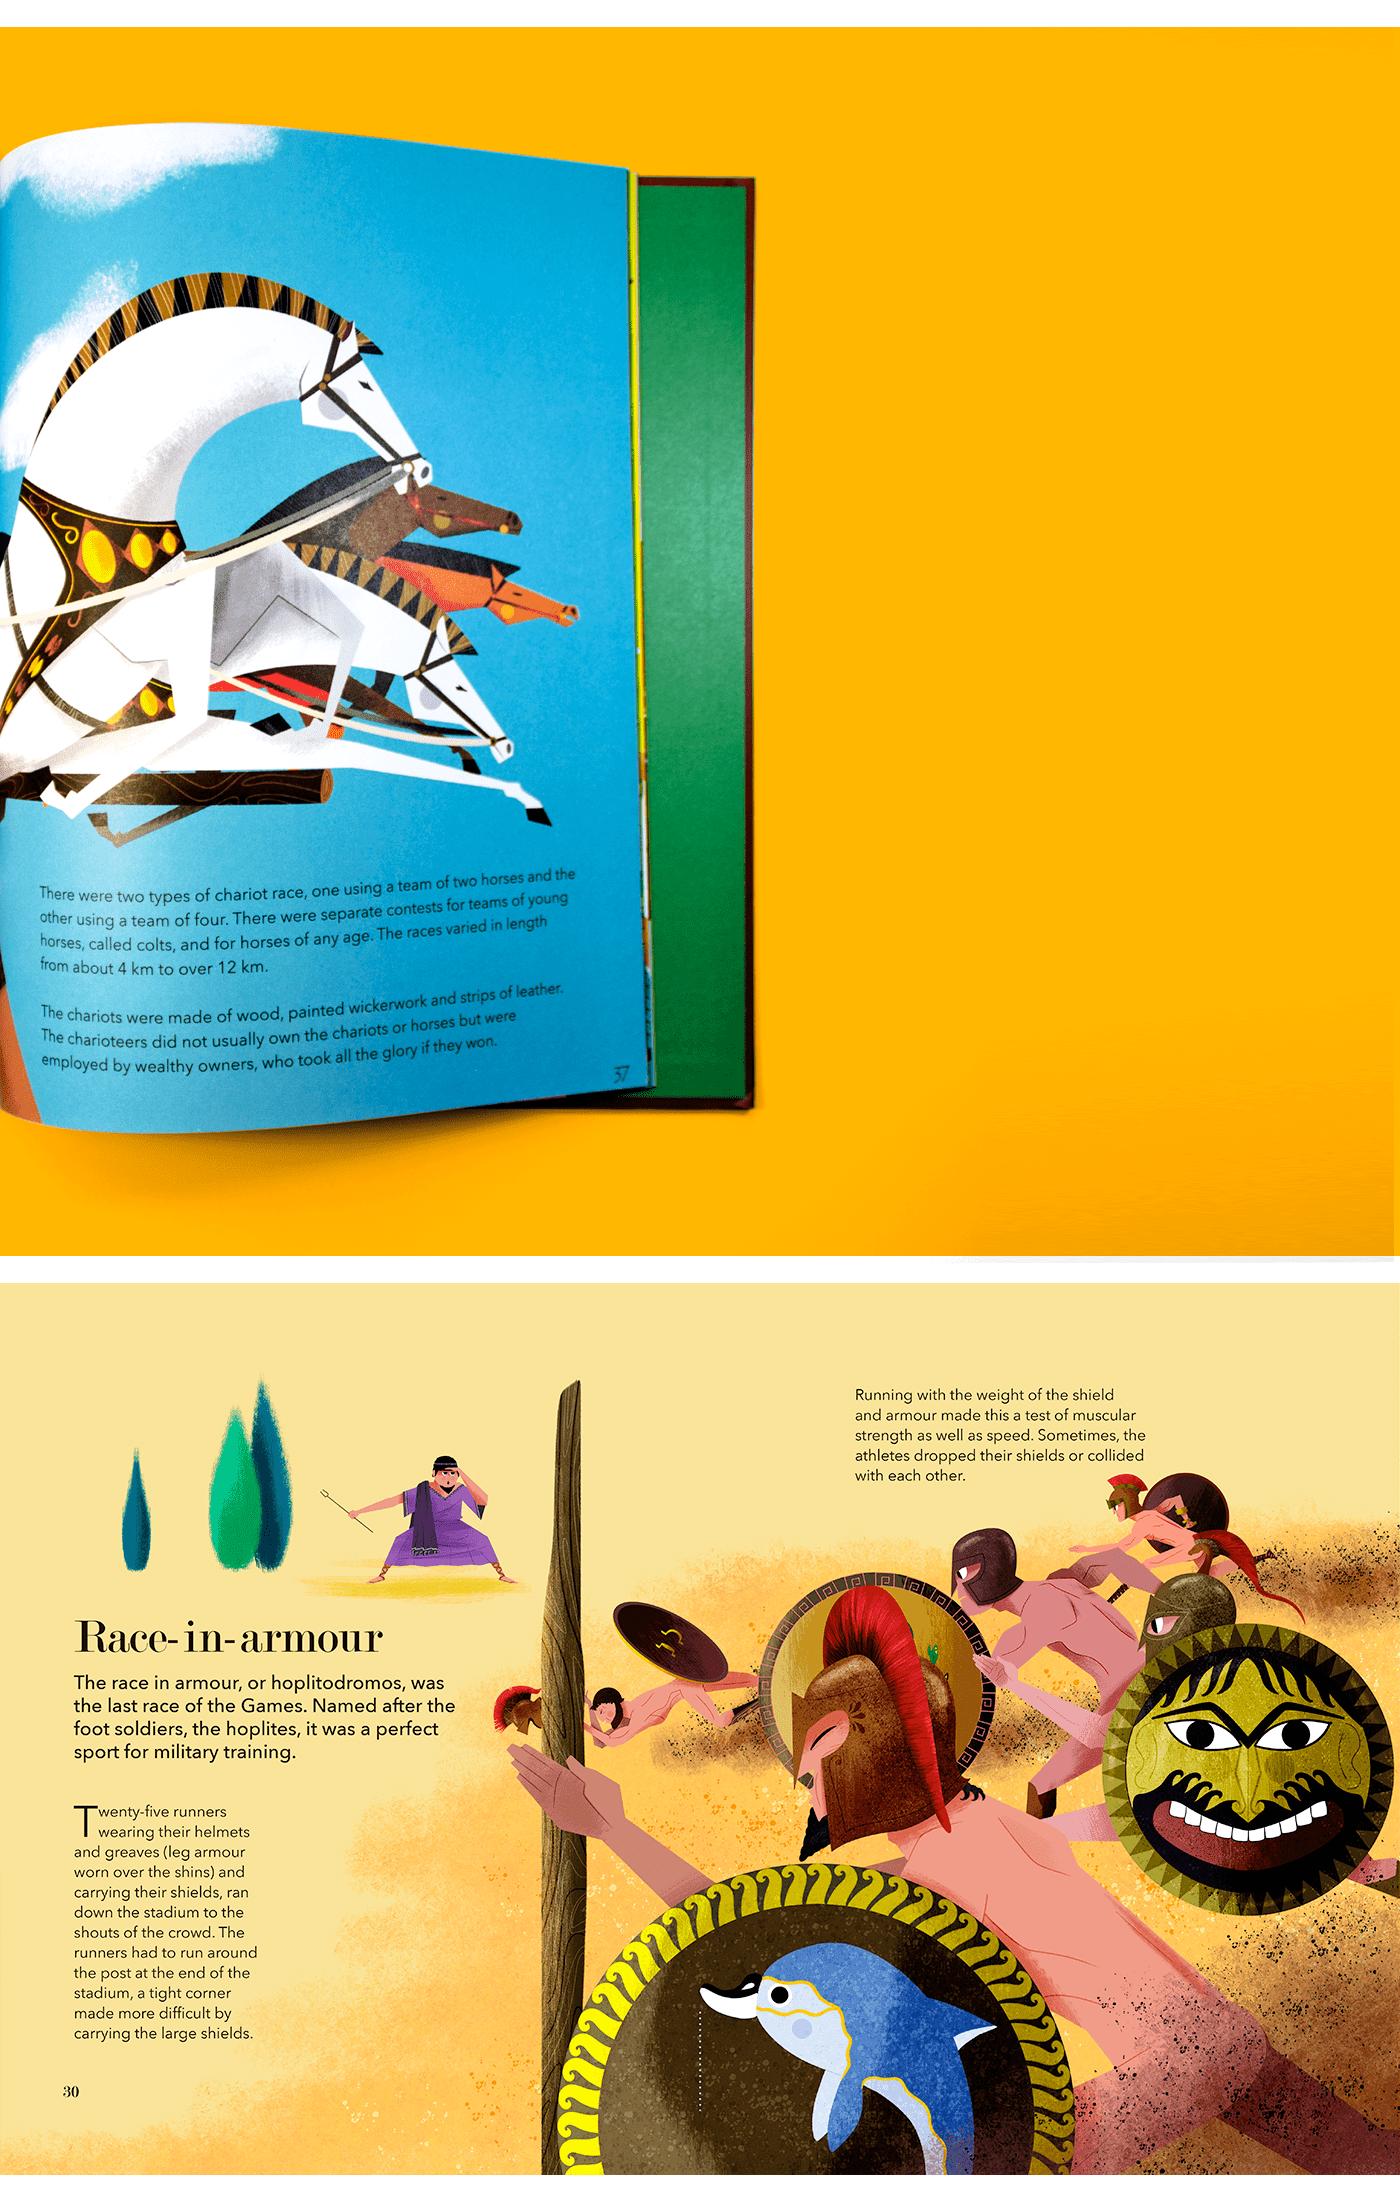 book childrens illustration libro infnatil greek Grecia libro ILUSTRADO illustration studio